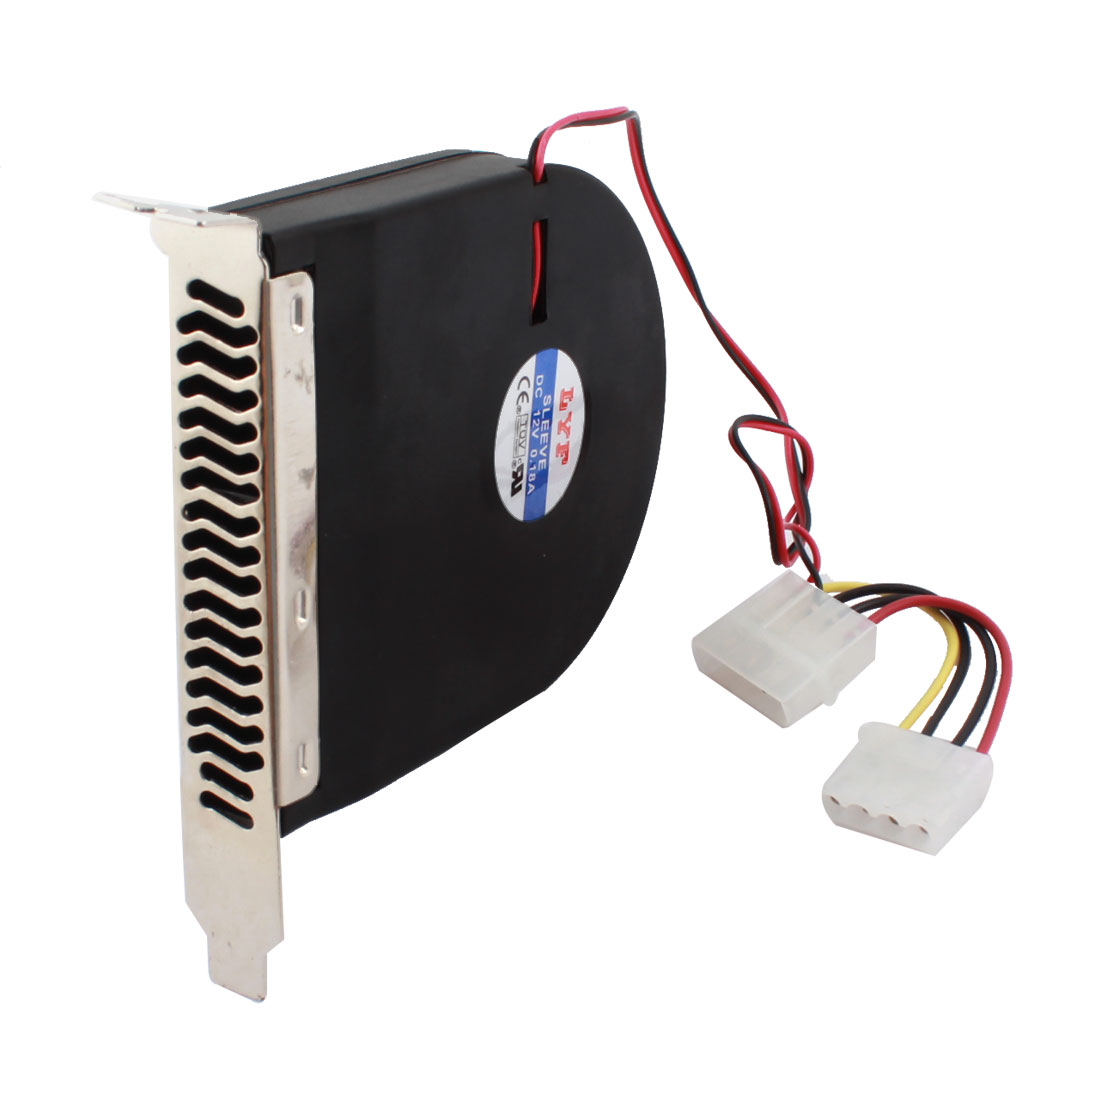 DC 12V 0.18A Black Plastic Housing Industrial Blower CPU Case PCI Slot DC Brushless Fan Ventilator Cooler